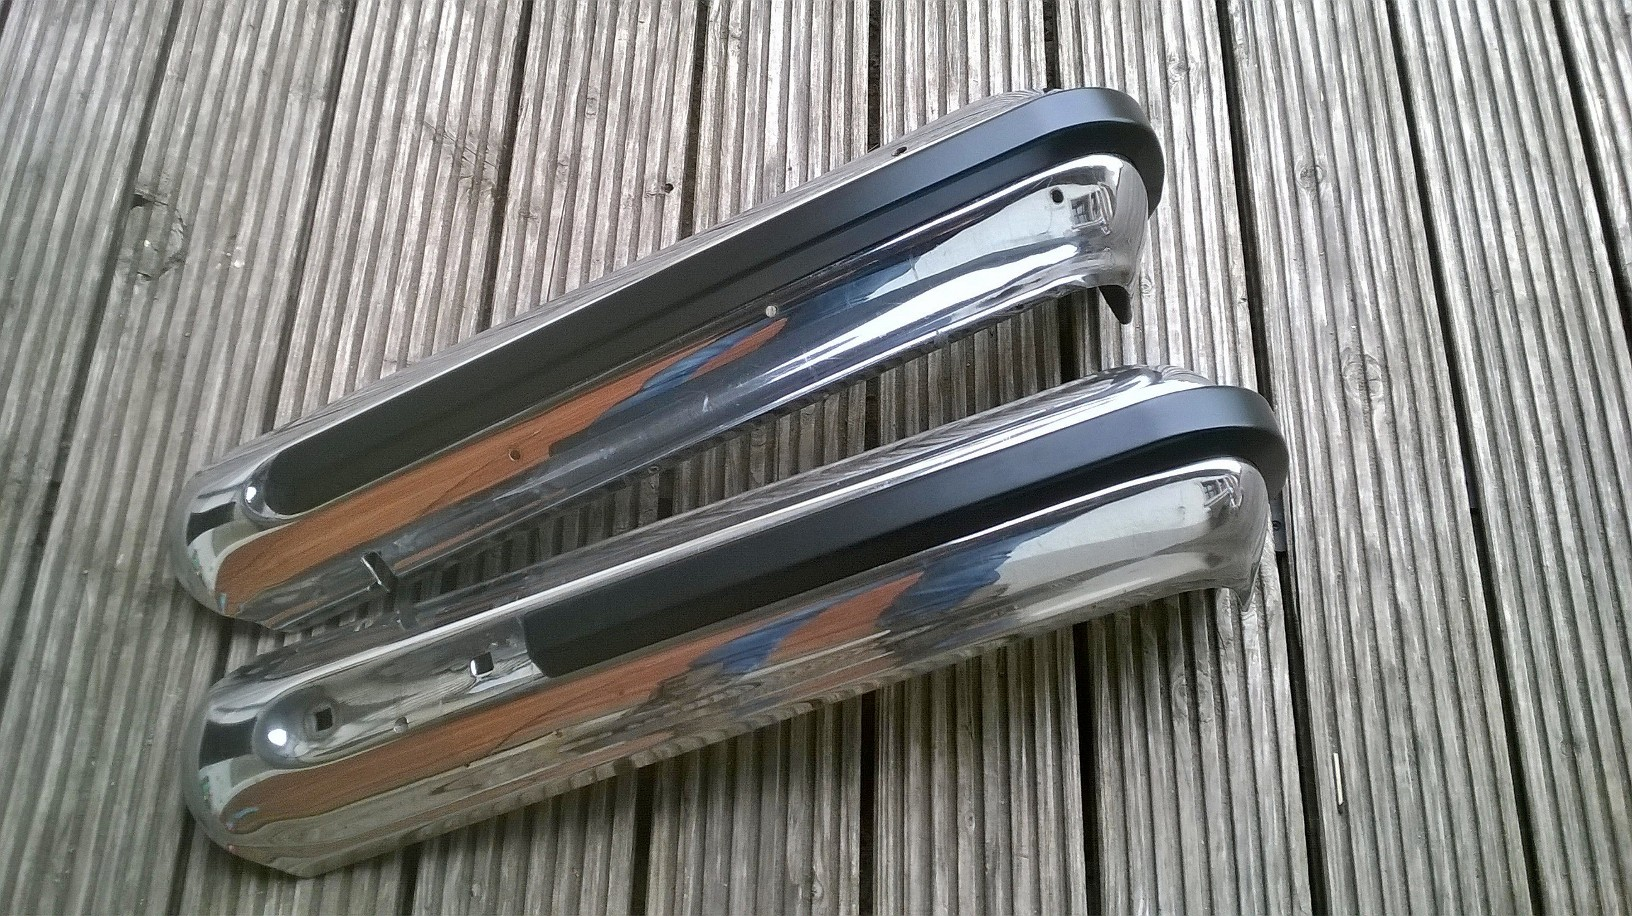 Jeep-wagoneer-gladiator-bumper-stripes-original-view-22